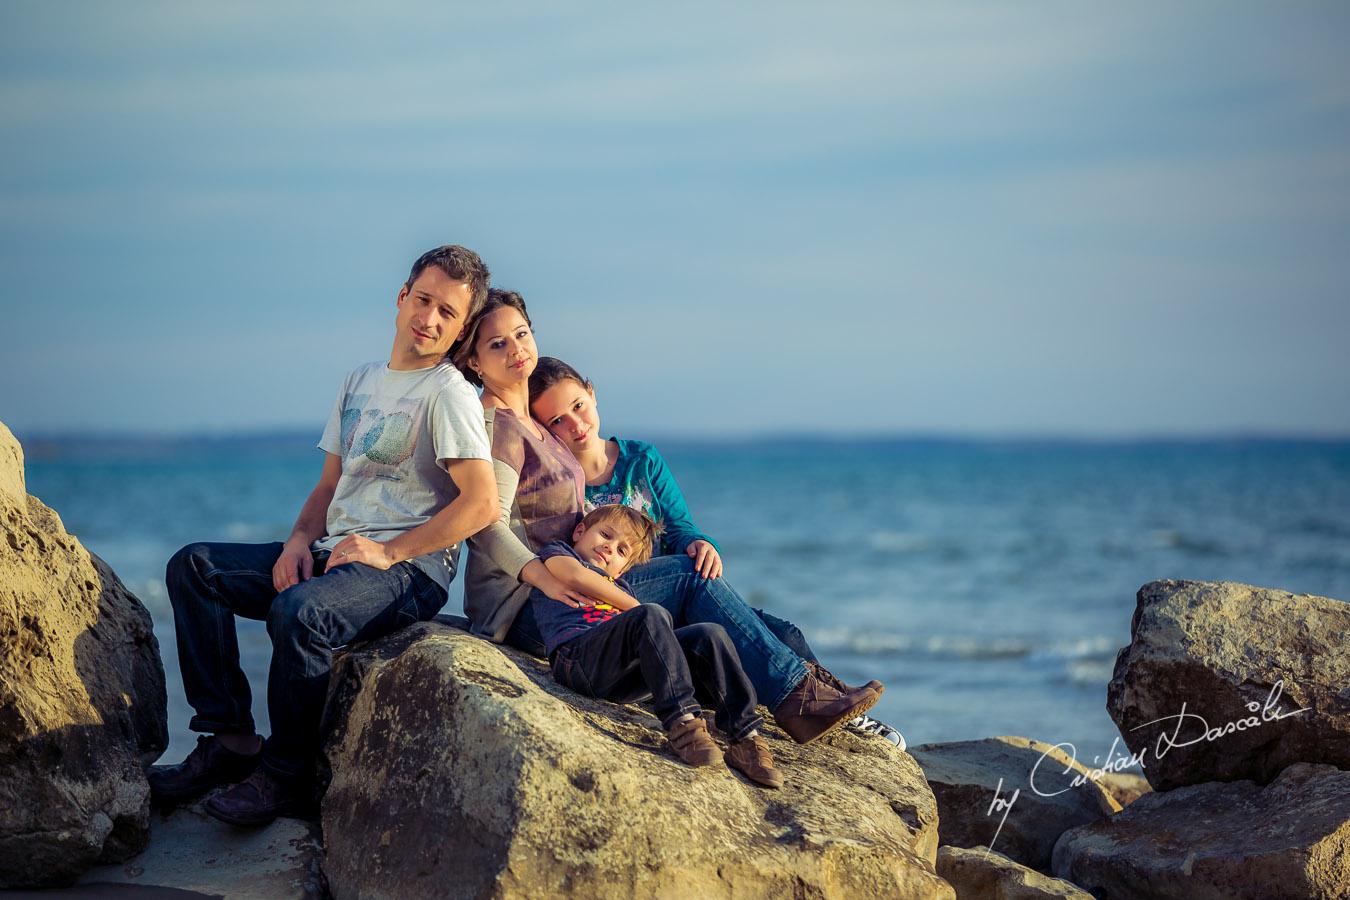 Photo shoot in Cyprus, Curium Beach. Photographer: Cristian Dascalu